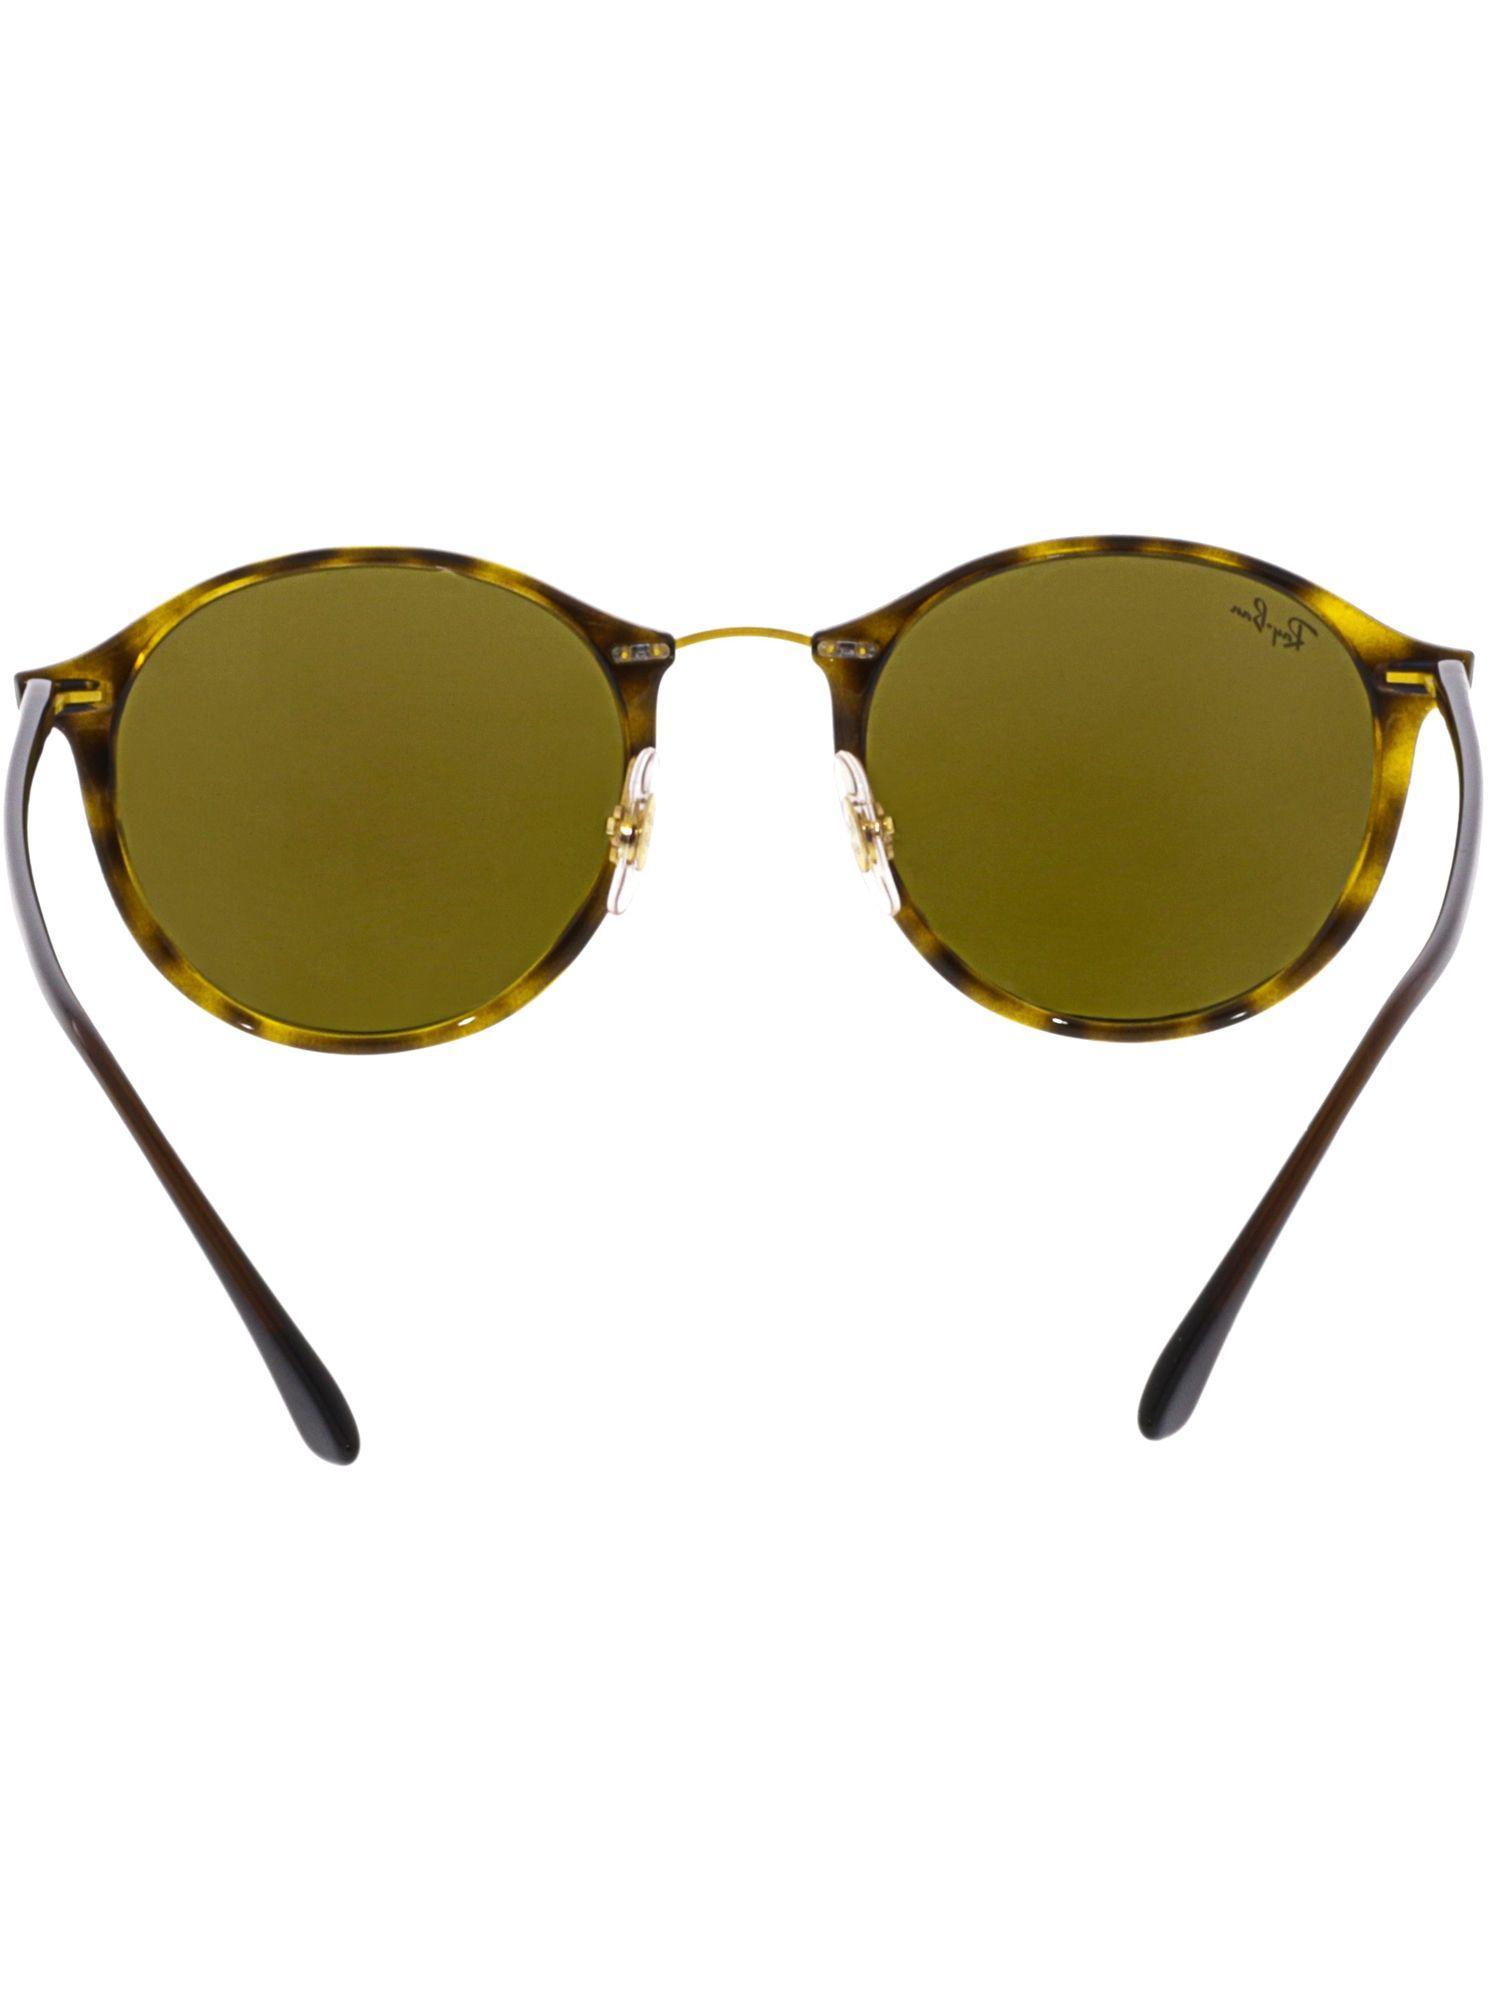 c849d3e4b7 Lyst - Ray-Ban Rb4242 Sunglasses for Men